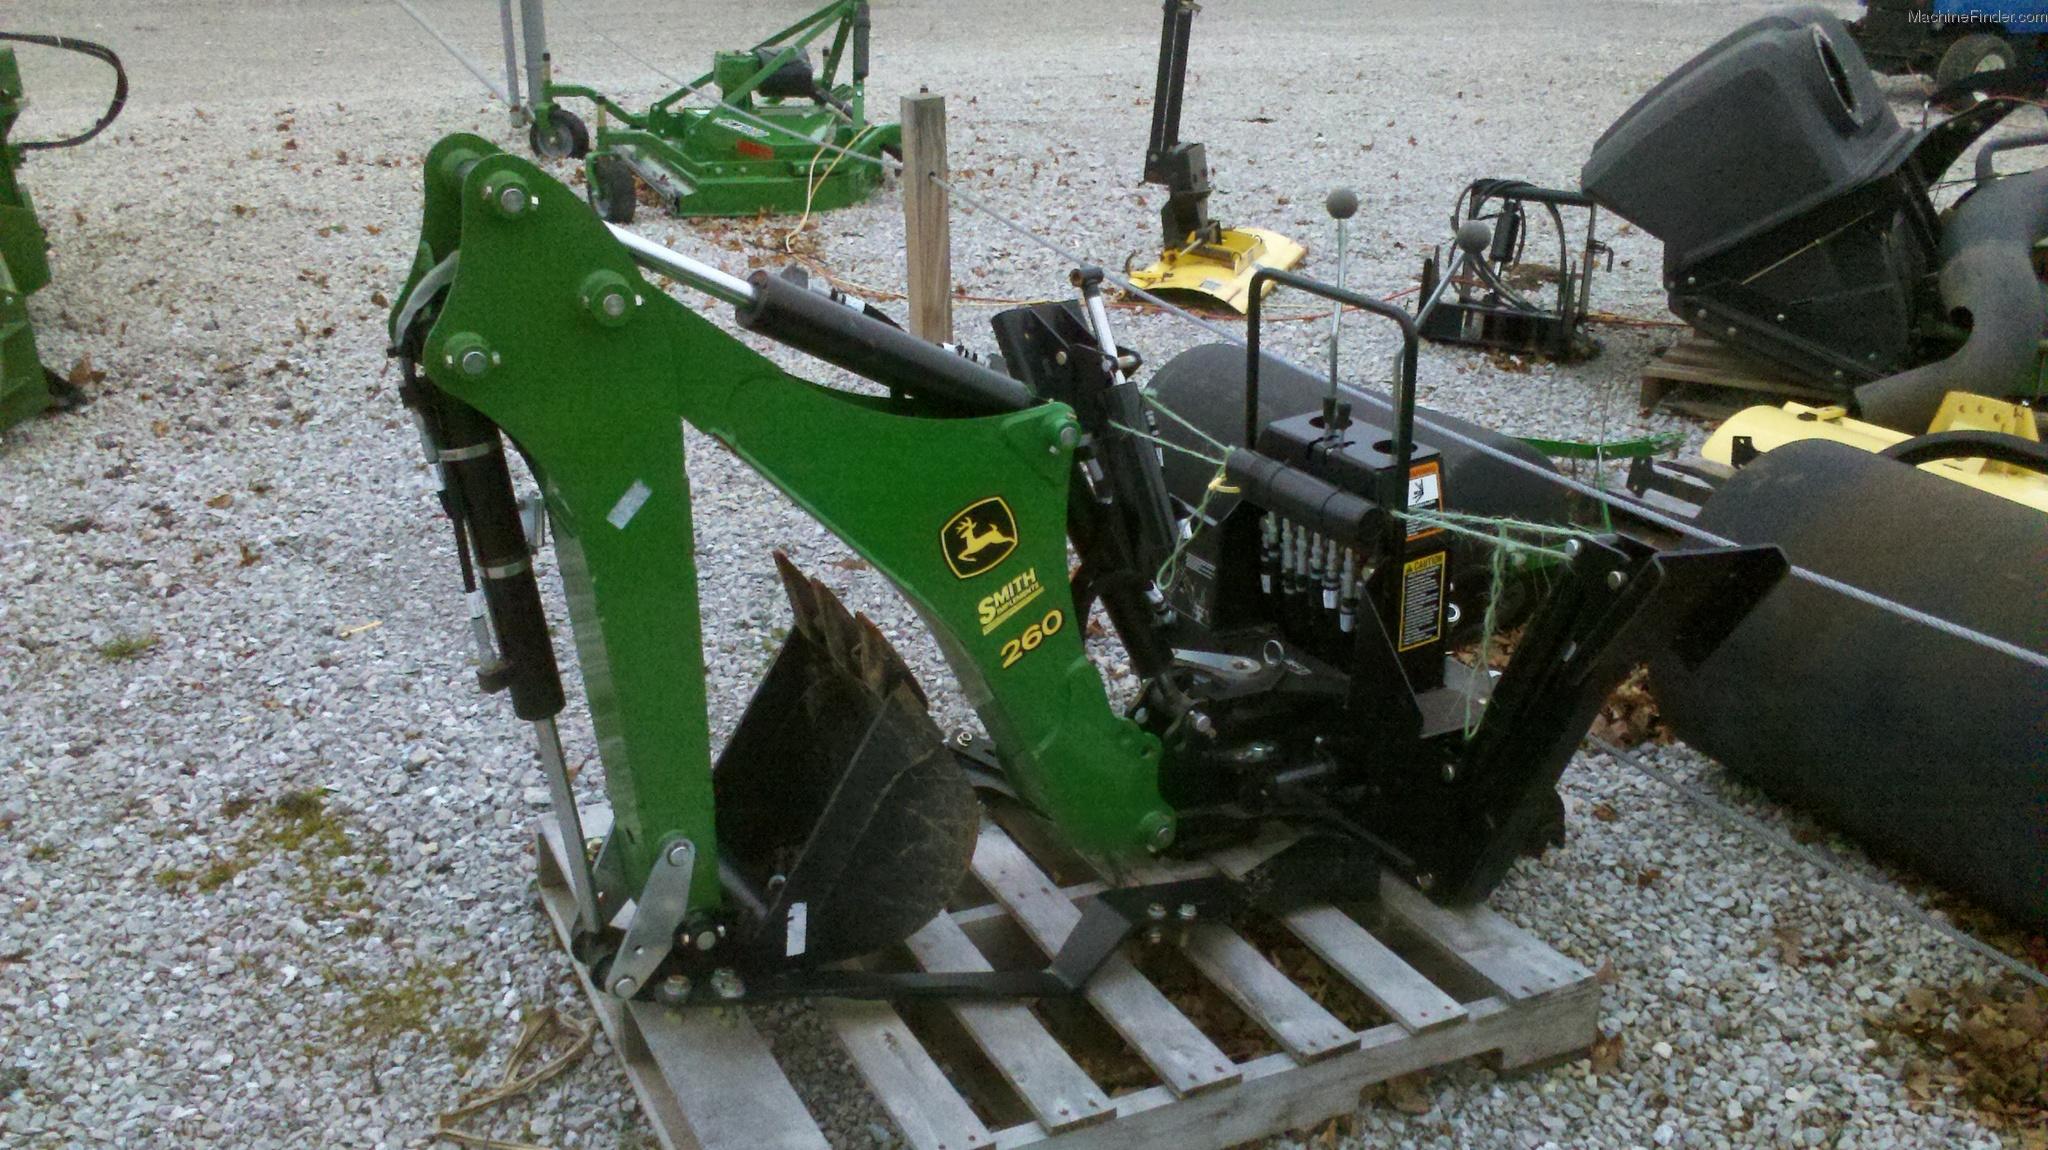 2010 John Deere 260 Tractors - Compact (1-40hp.) - John ...